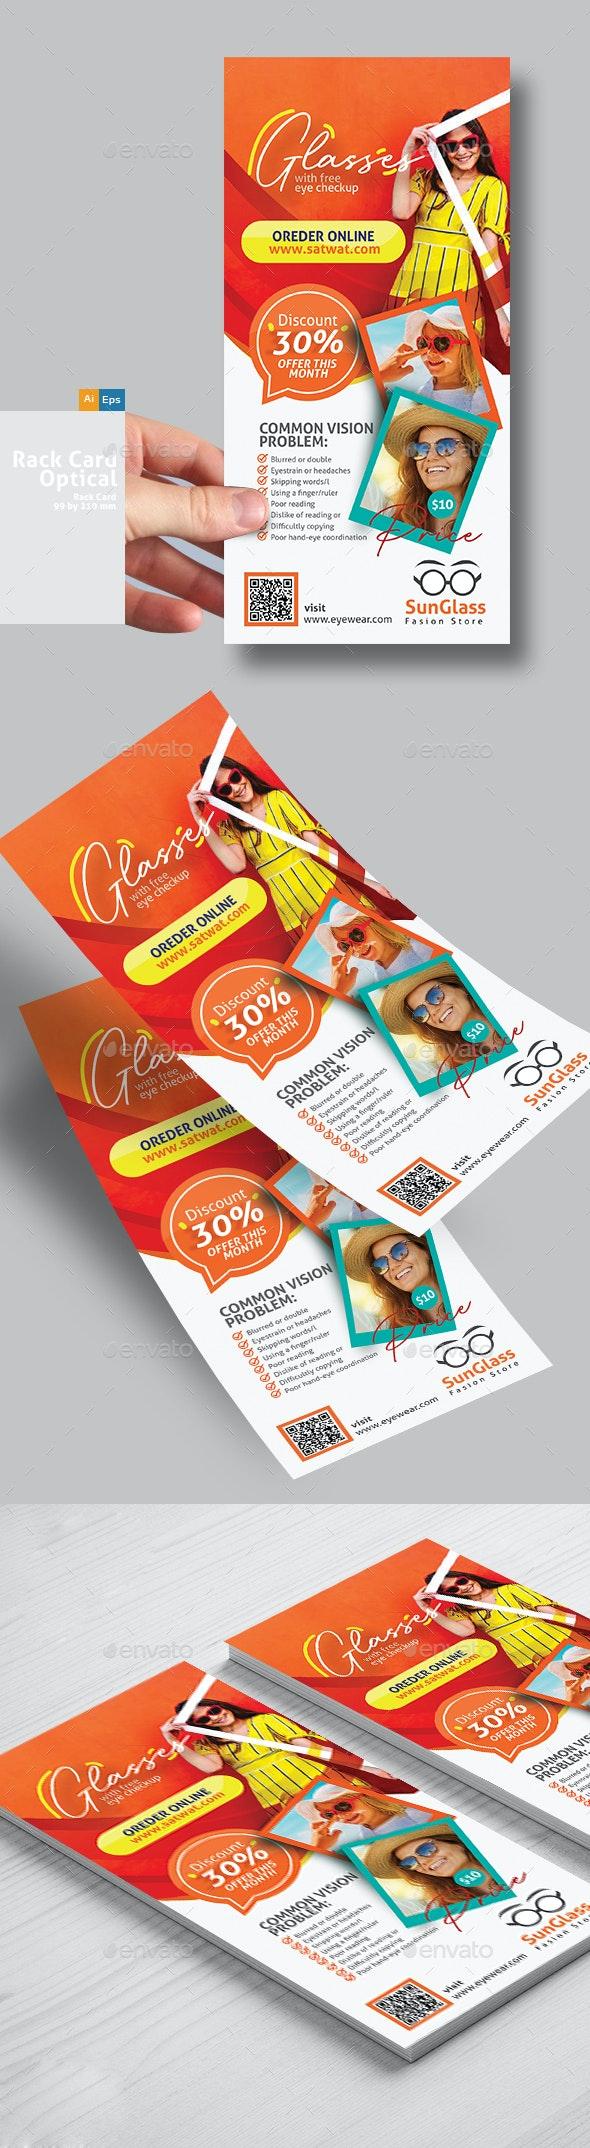 SunGlasses Fashion Store Rack Card Template - Flyers Print Templates